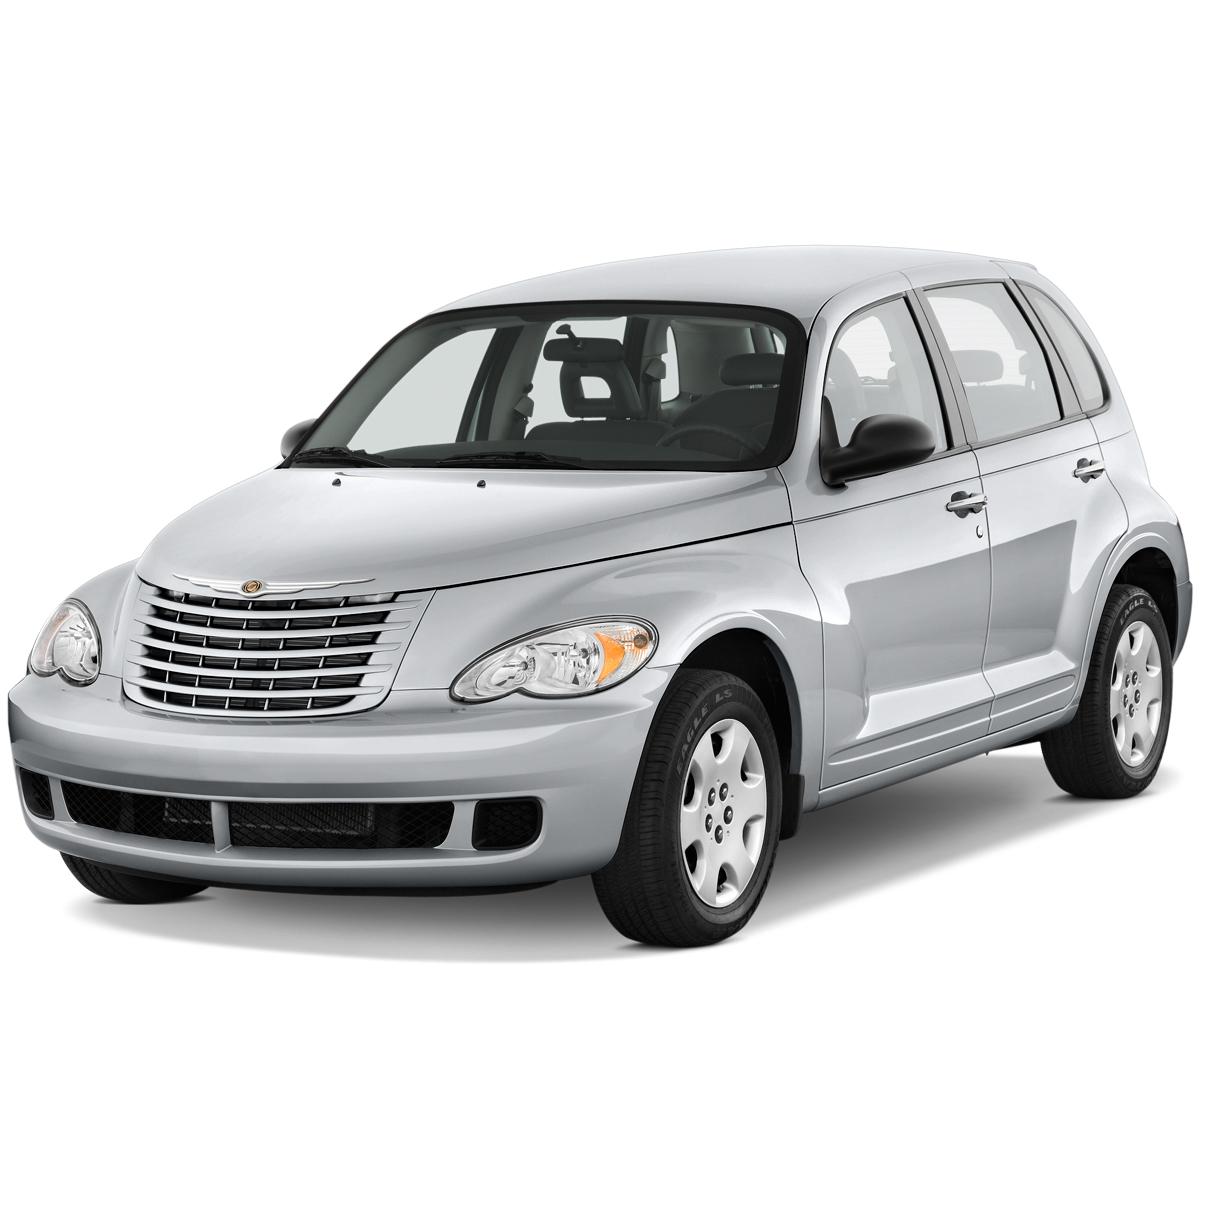 Chrysler PT Cruiser 2000 Onwards